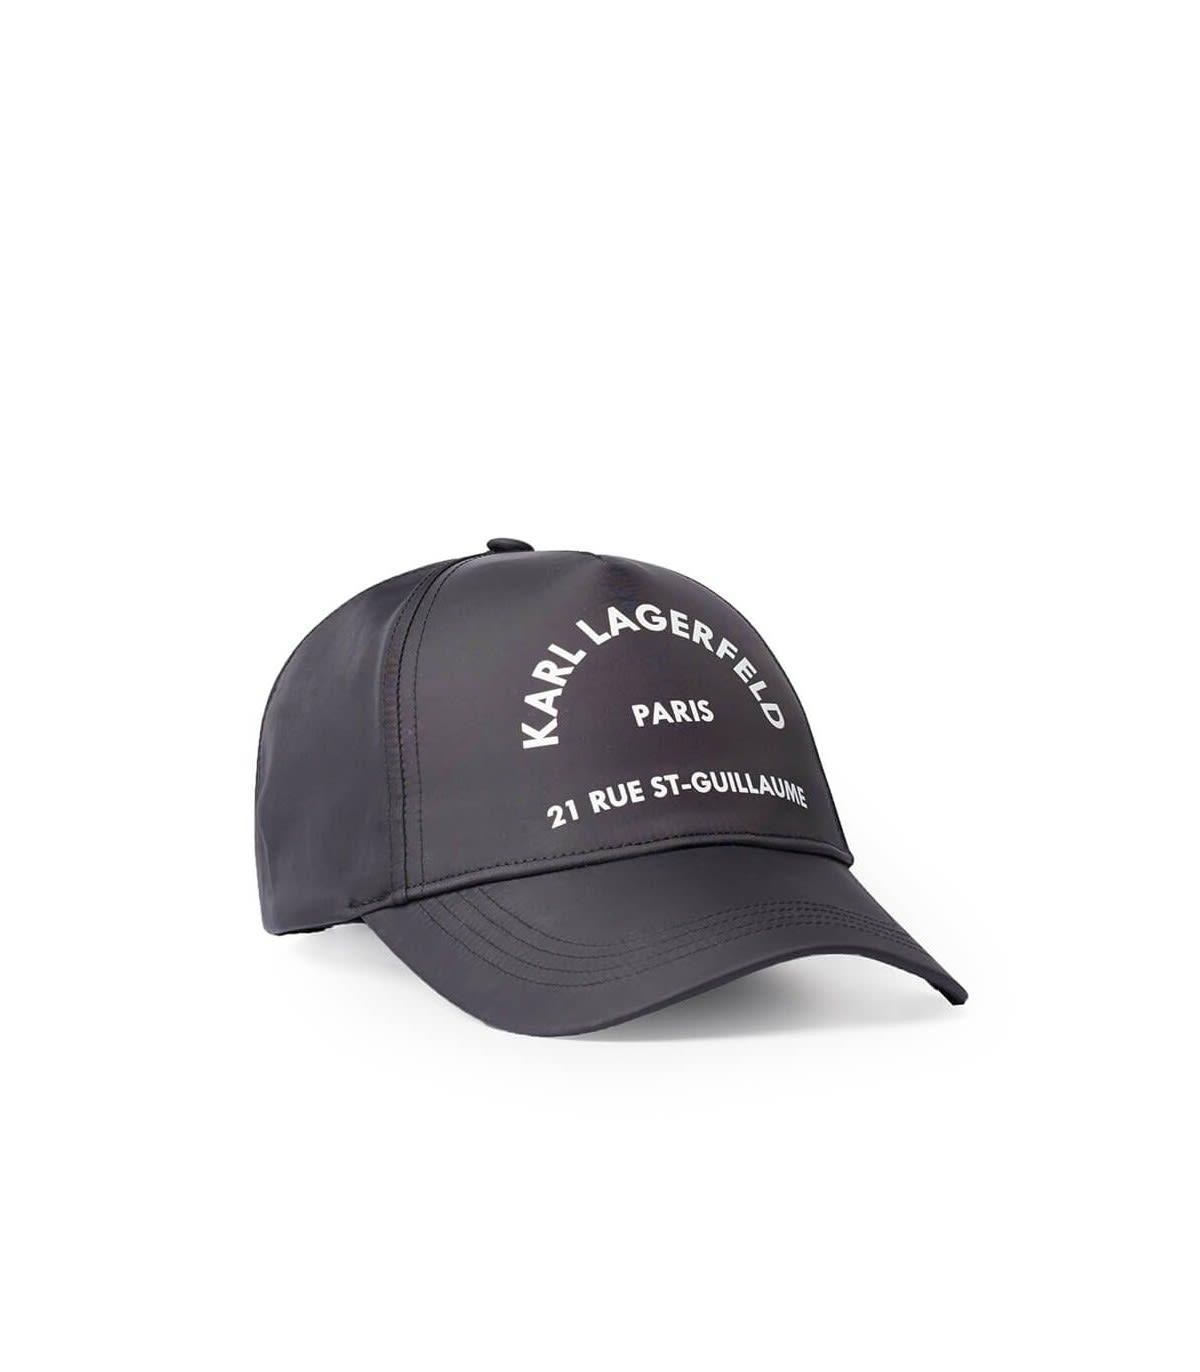 Karl Lagerfeld Accessories BLACK RUE ST. GUILLAUME BASEBALL CAP